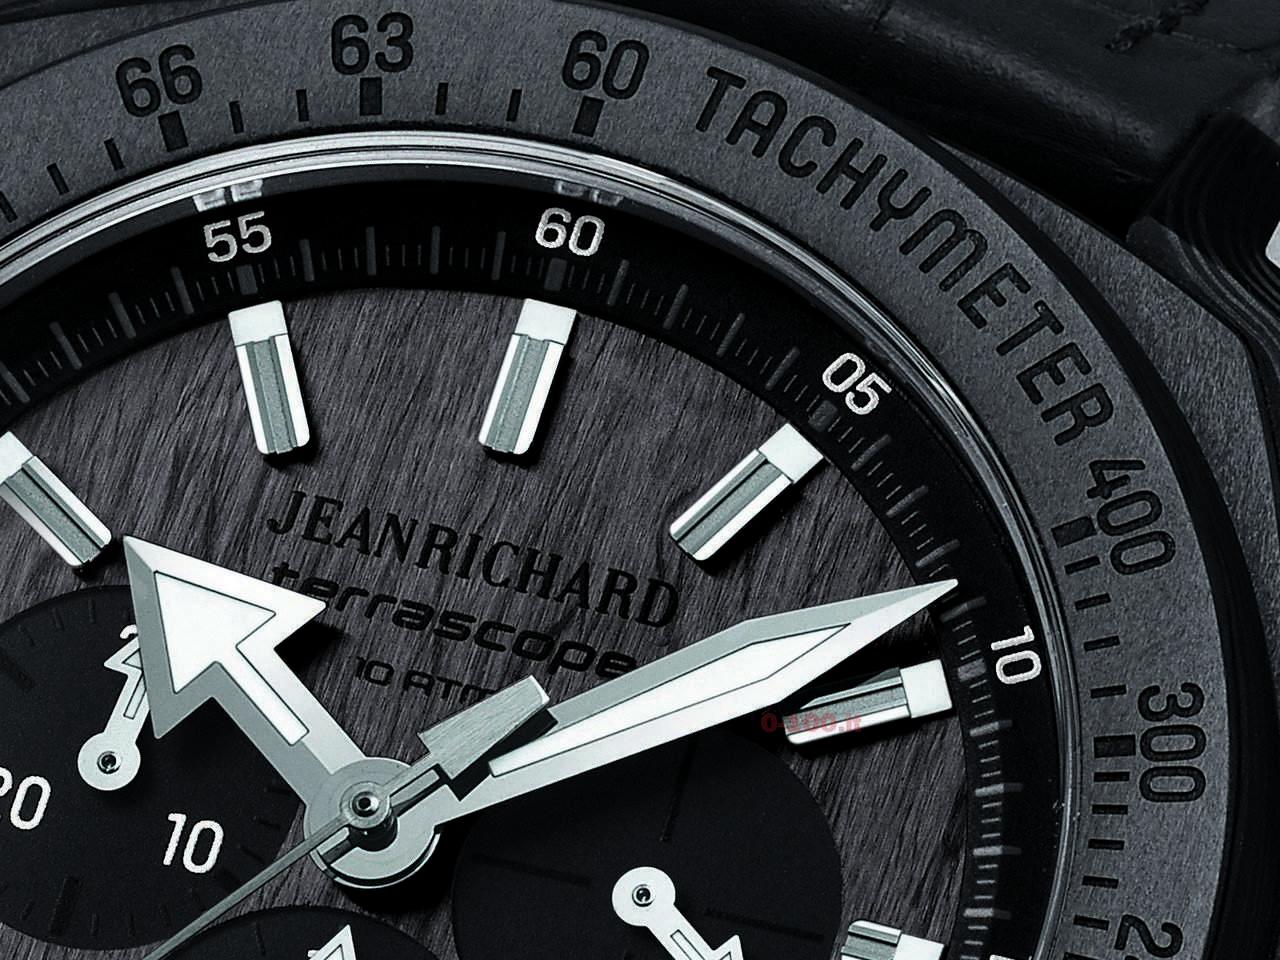 baselworld-2015_jean-richard-terrascope-chrono-carbonio-0-100-4